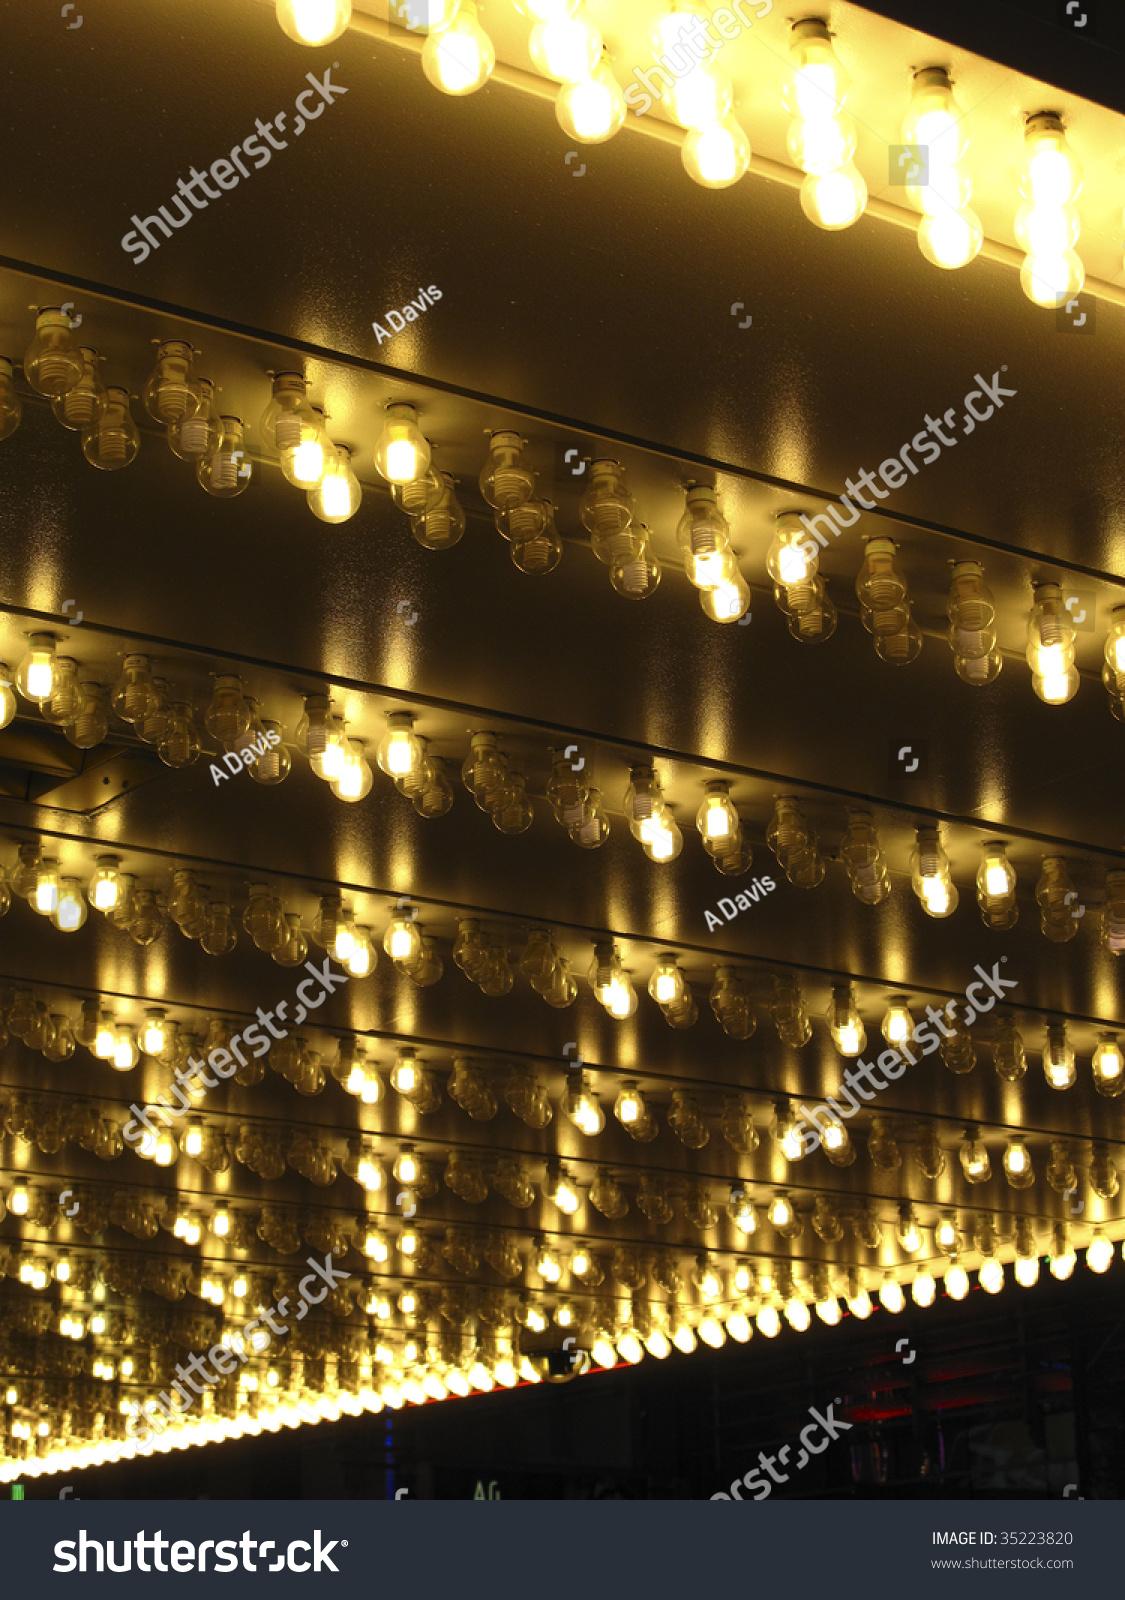 Overhanging Wall Lights : The Best 28 images of overhang light - garage door overhang garage overhang with lights cabin ...